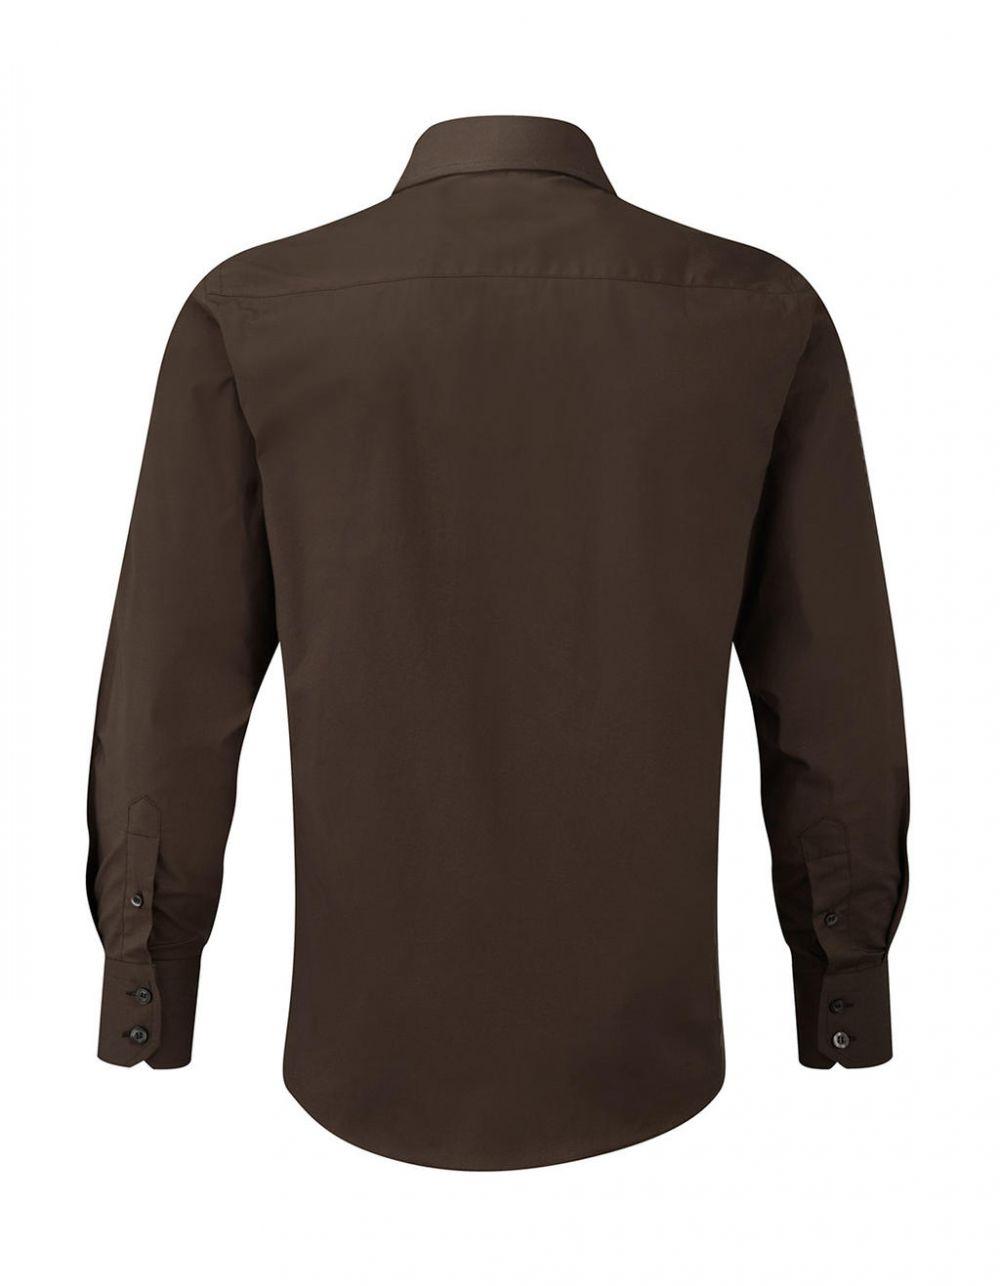 Camisa entallada manga larga hombre Russell Collection desde